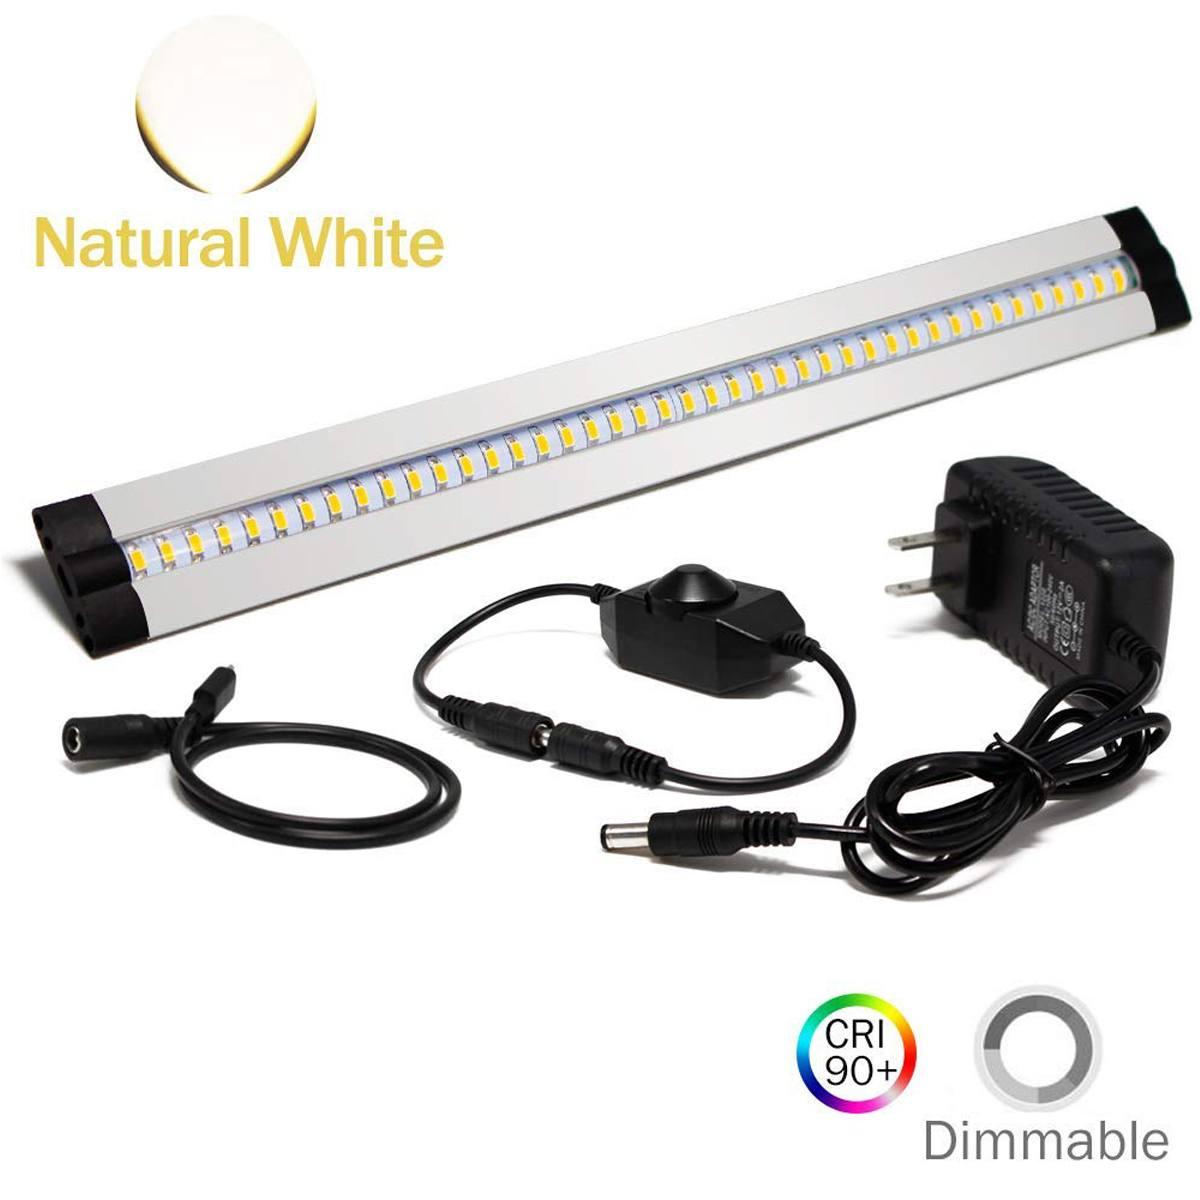 30CM LED Under Cabinet Strip Light Bar Lamp CRI90 Warm Dimmable Waterproof Table Lamp desk light For Reading Study Office Light 5